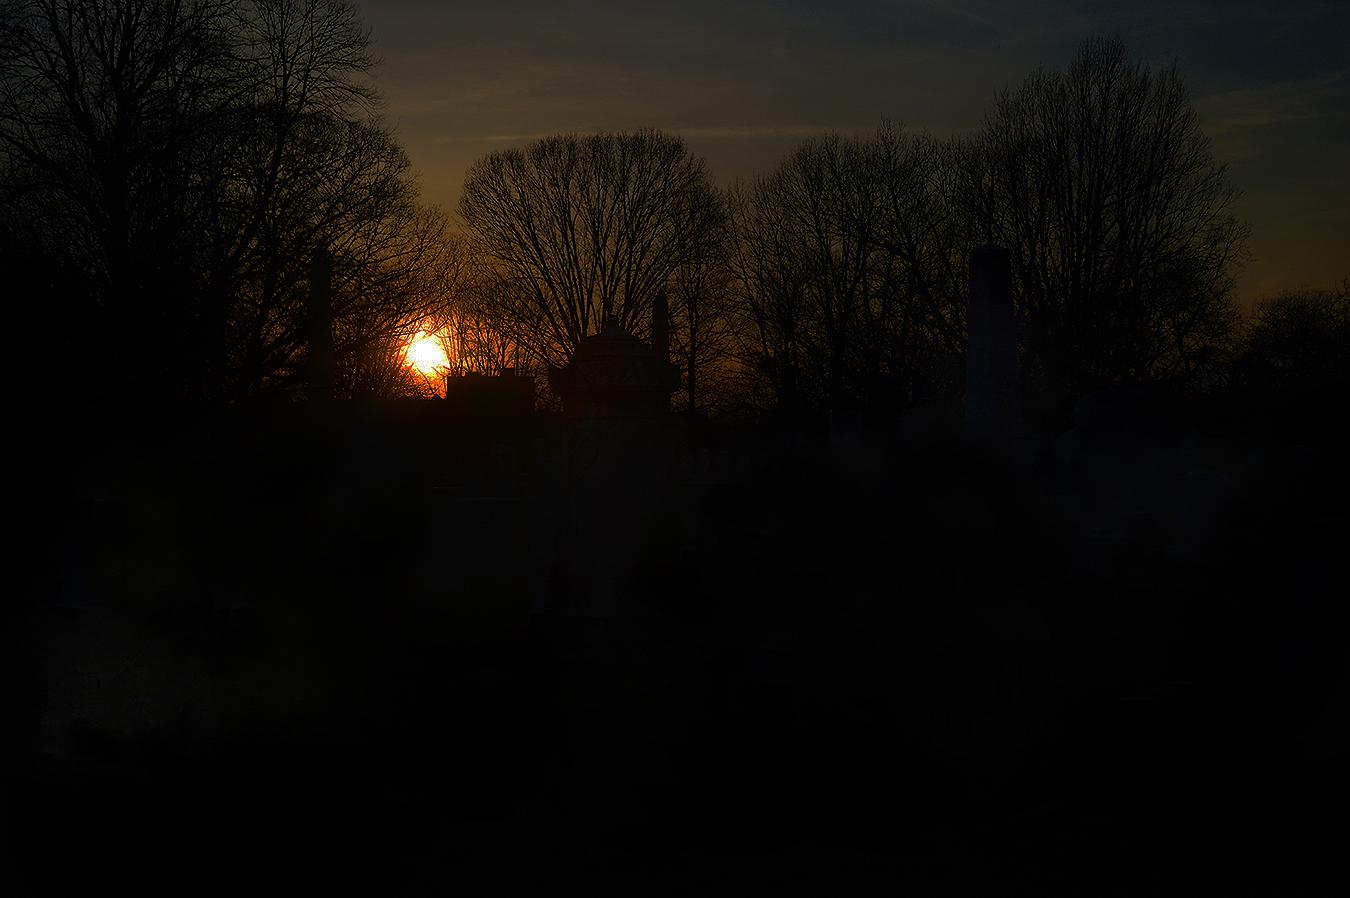 Woodlands_Cemetery_Gravestones_Trees_Sunset_Dusk_Silhouette_Philadelphia_PA